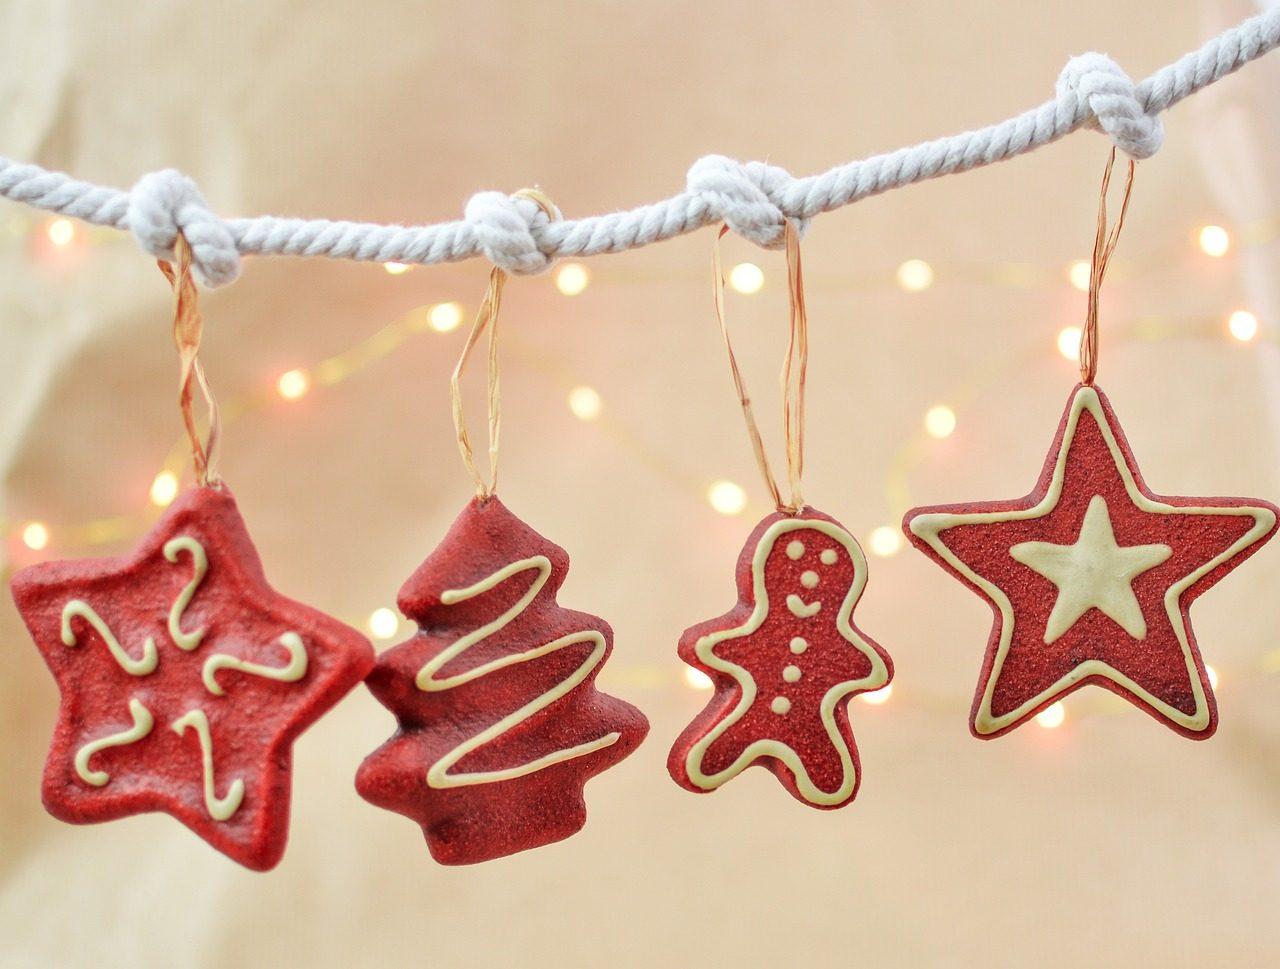 christmas-2939156_1280-1280x969.jpg